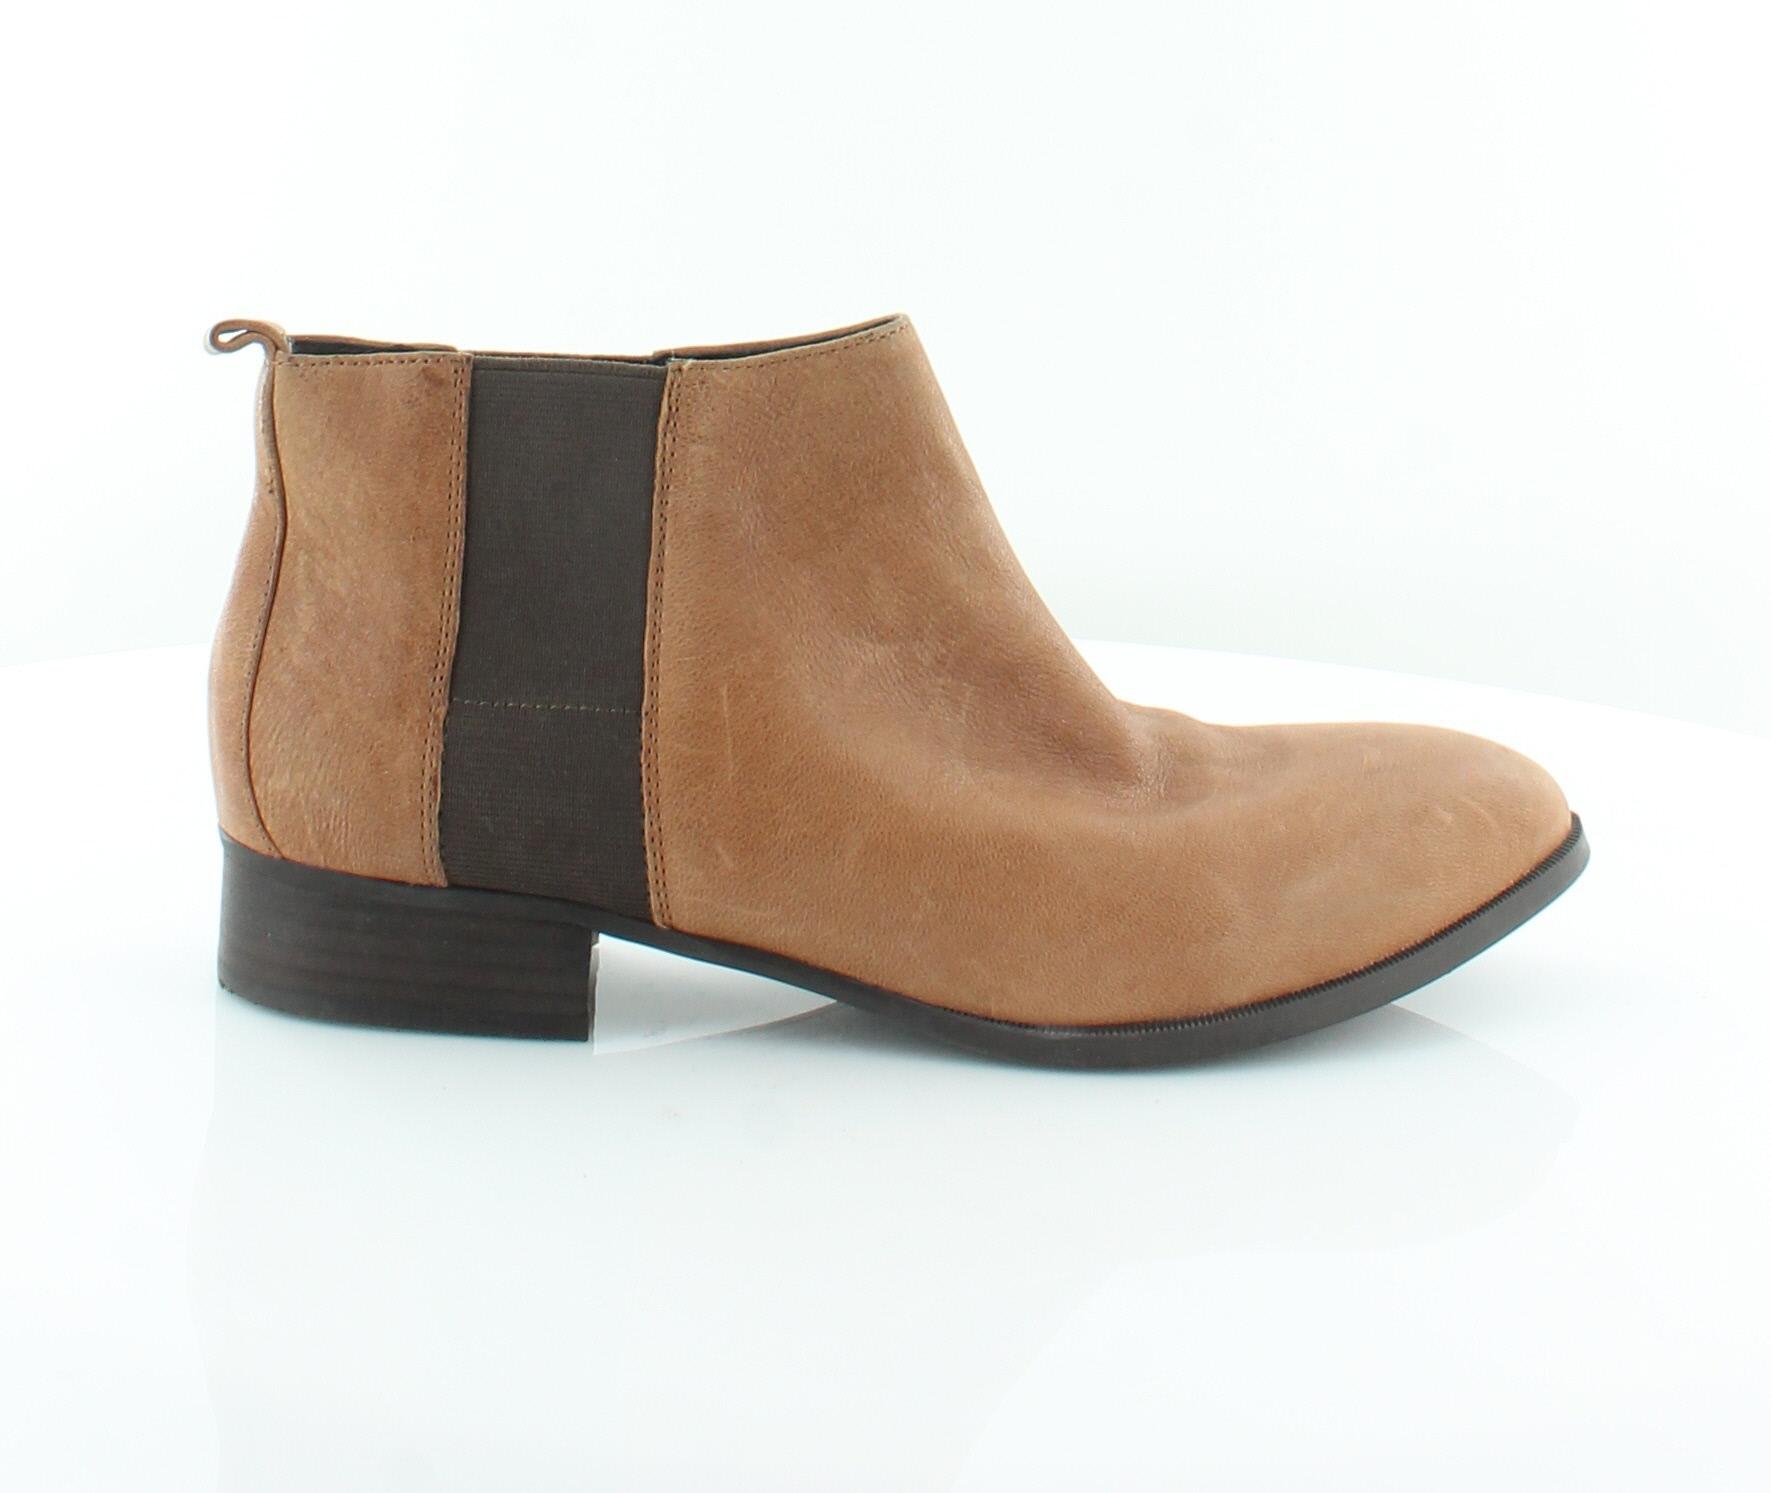 Nine West Nolynn Women's Boots Cog/DBR Size 8 M